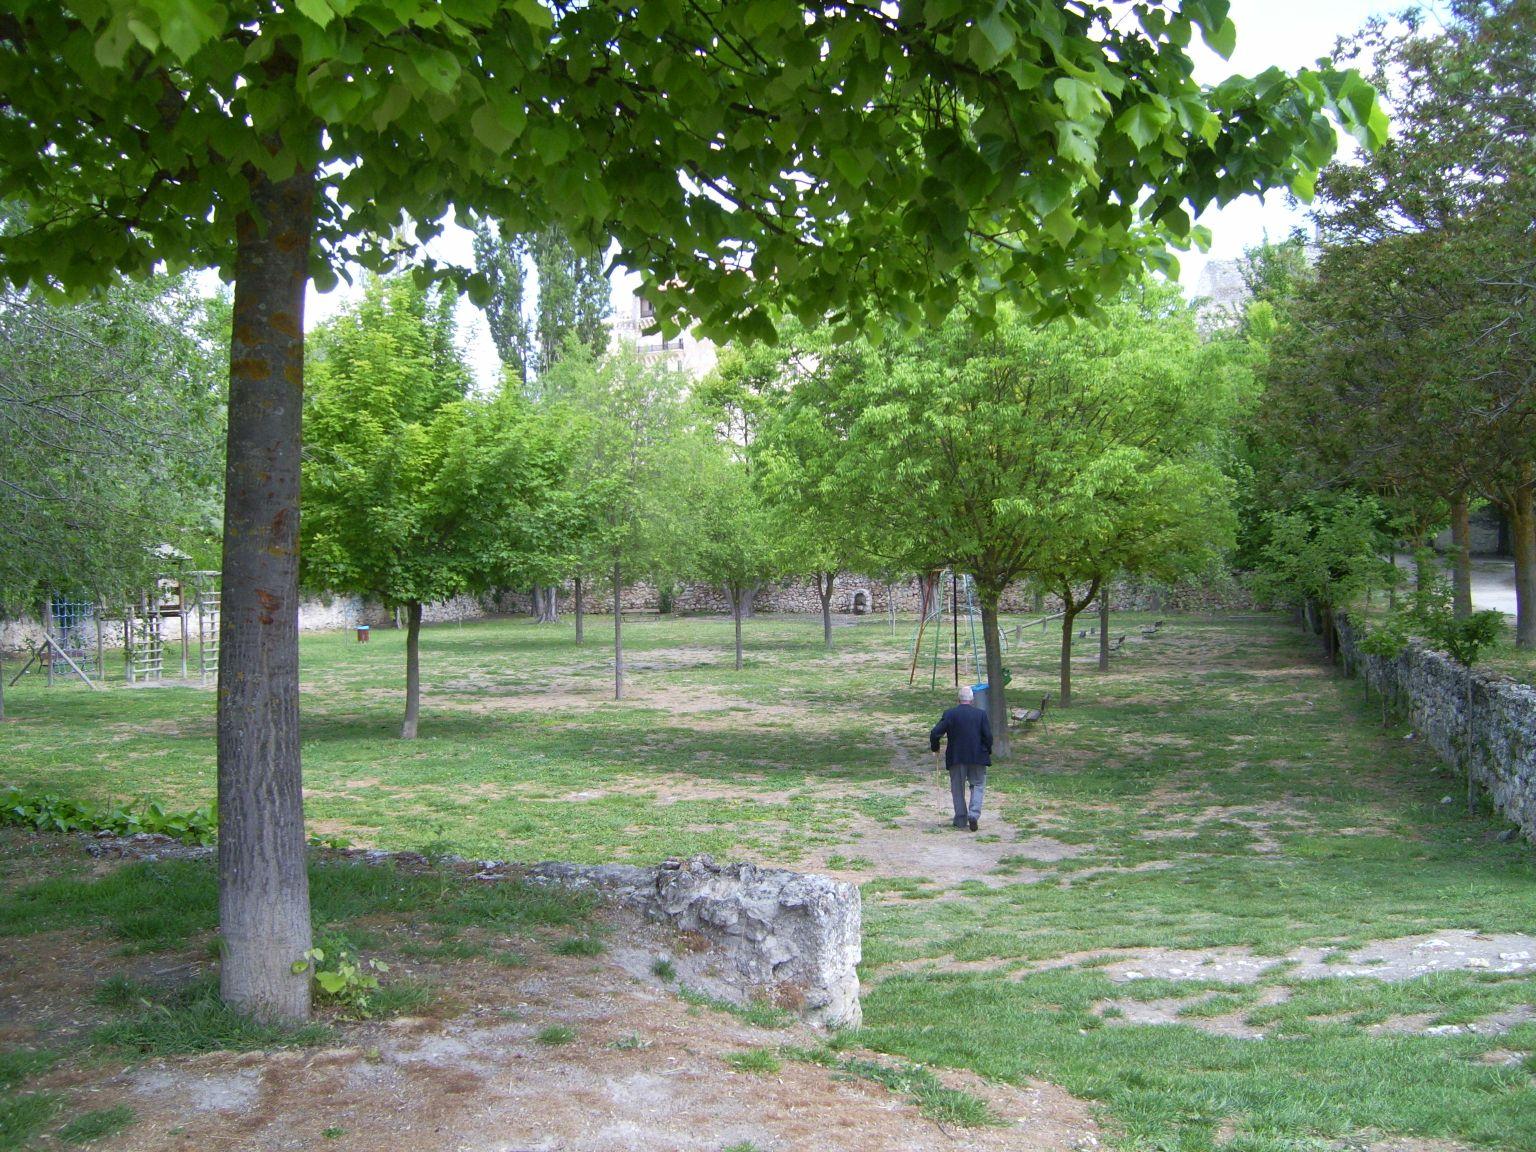 El parque de la huerta del duque